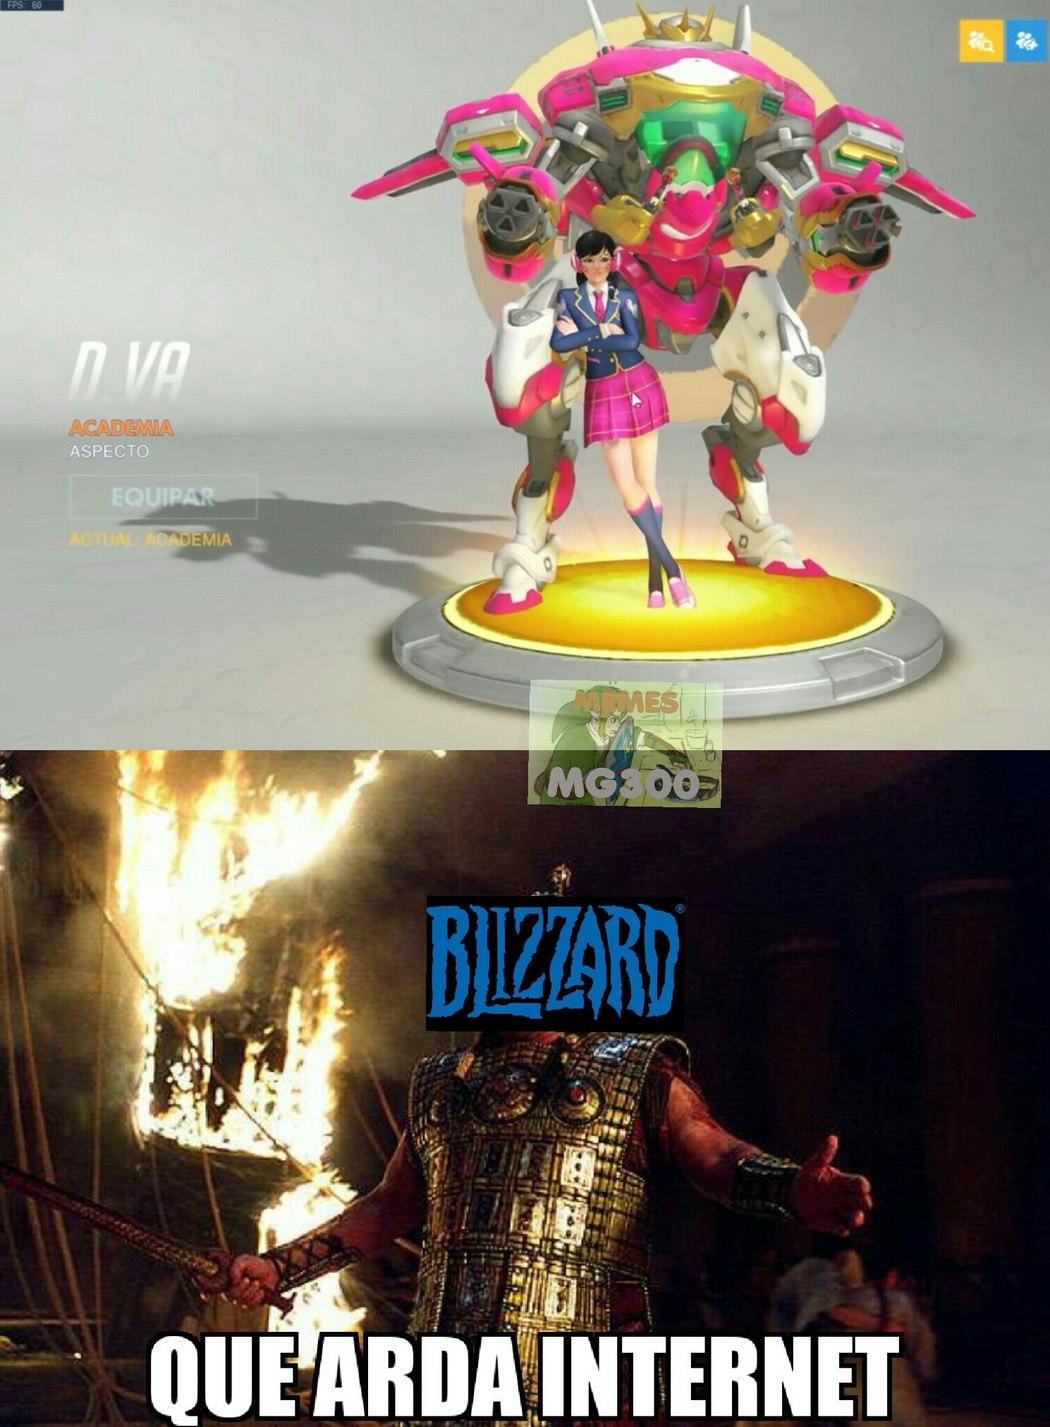 Blizzard, tu te lo has buscado - meme